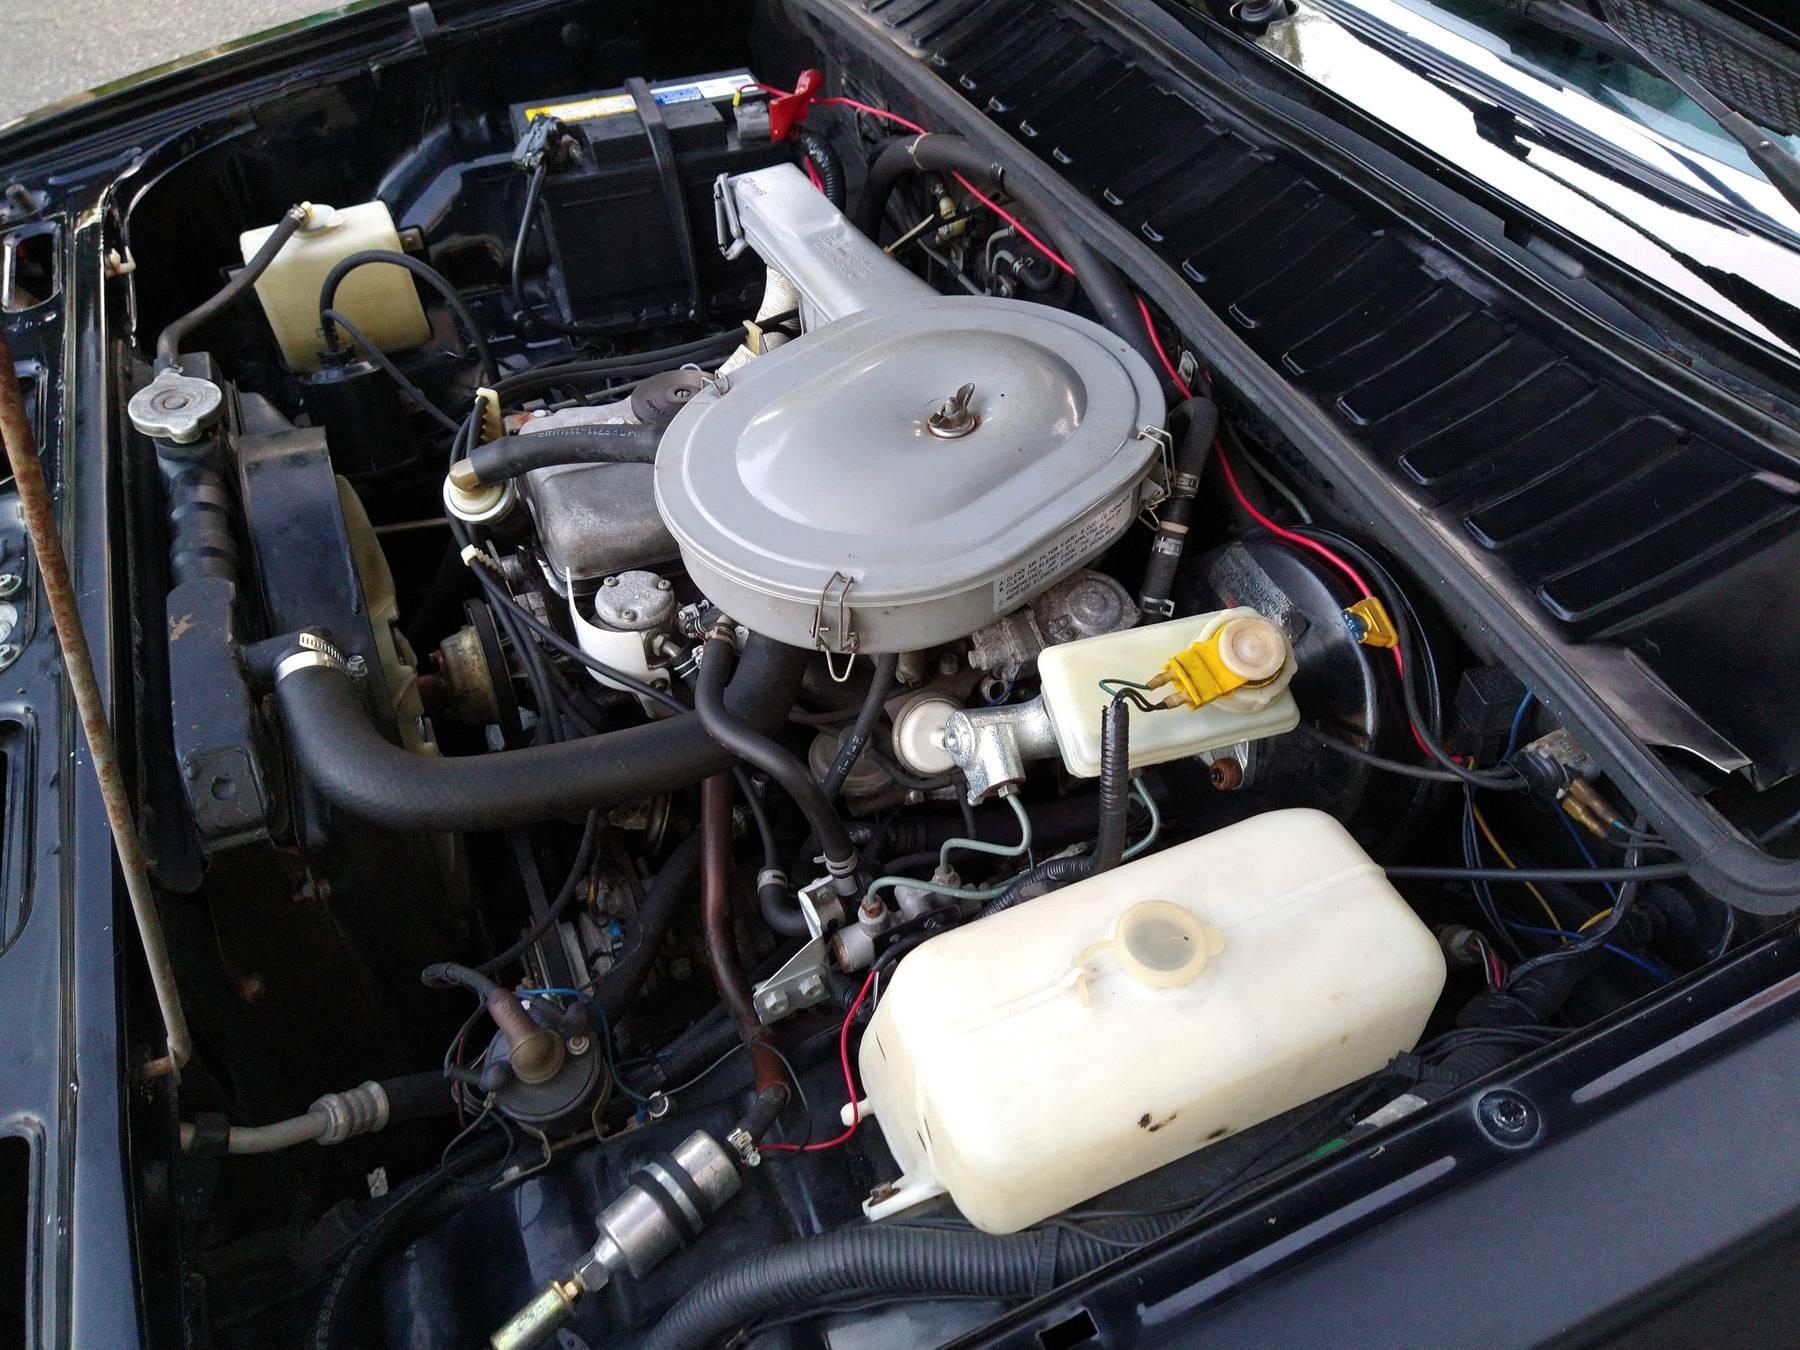 1986 Hyundai Stellar Executive engine bay angle